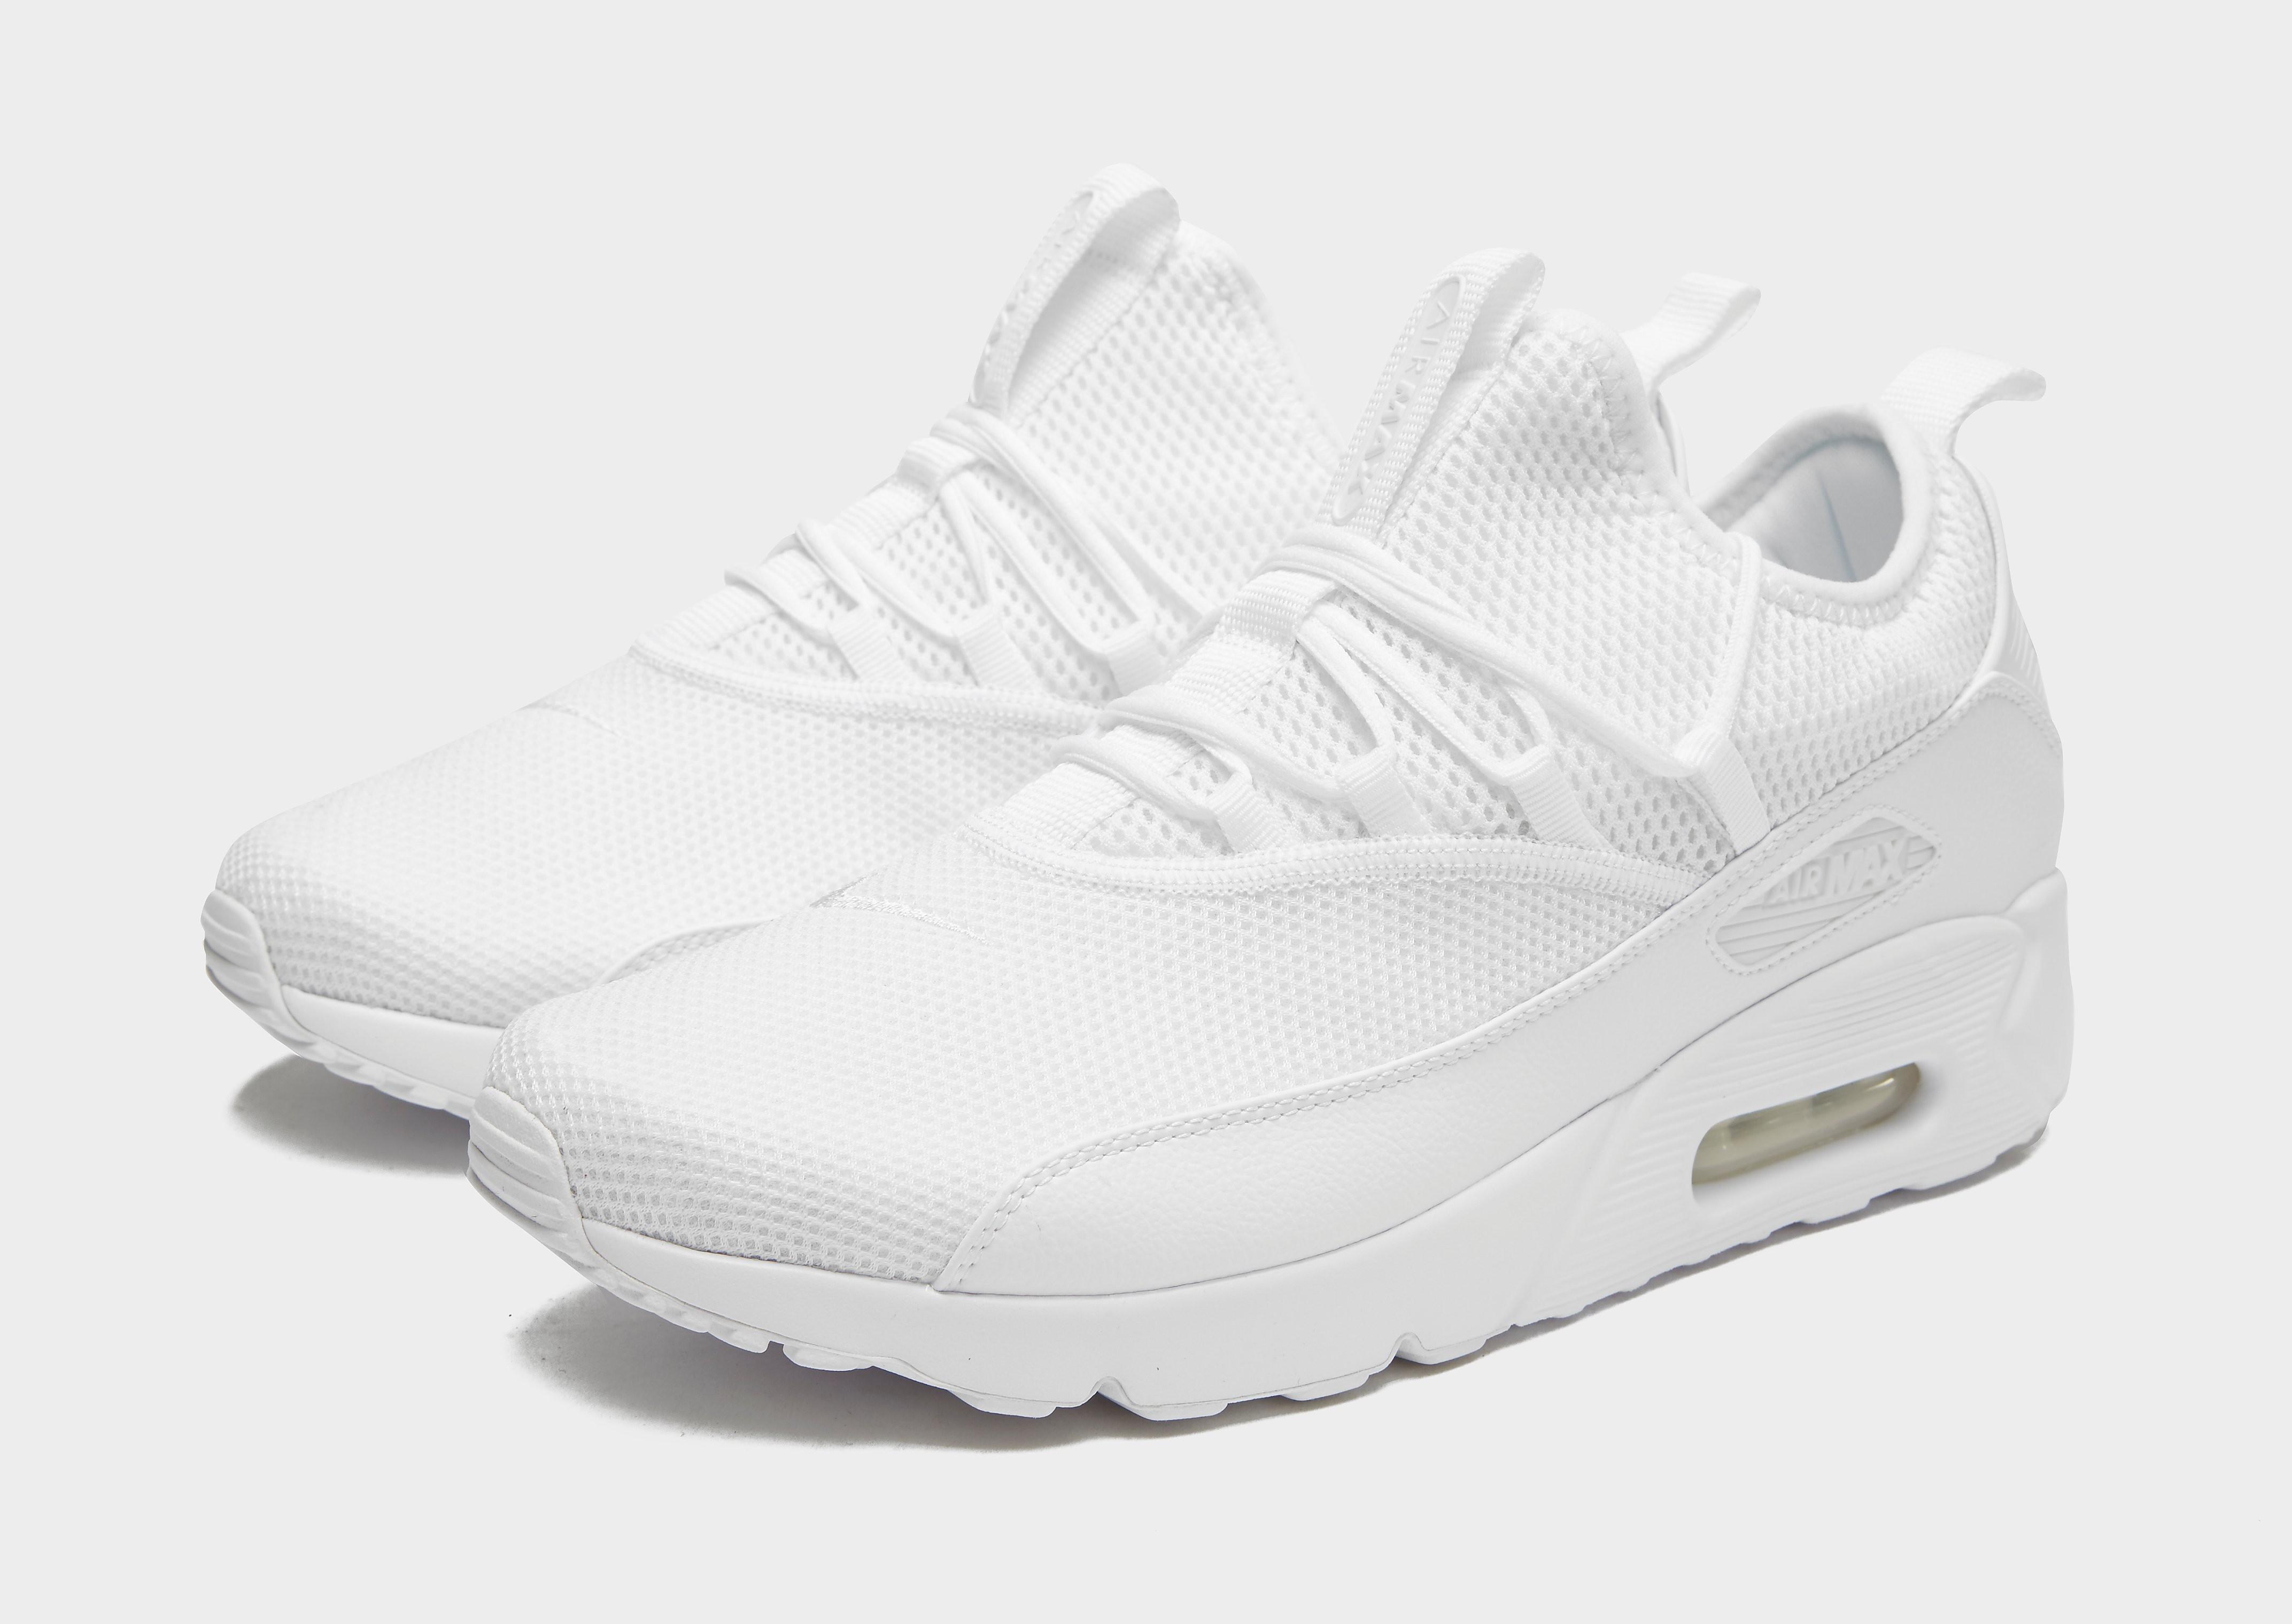 Nike Air Max 90 EZ